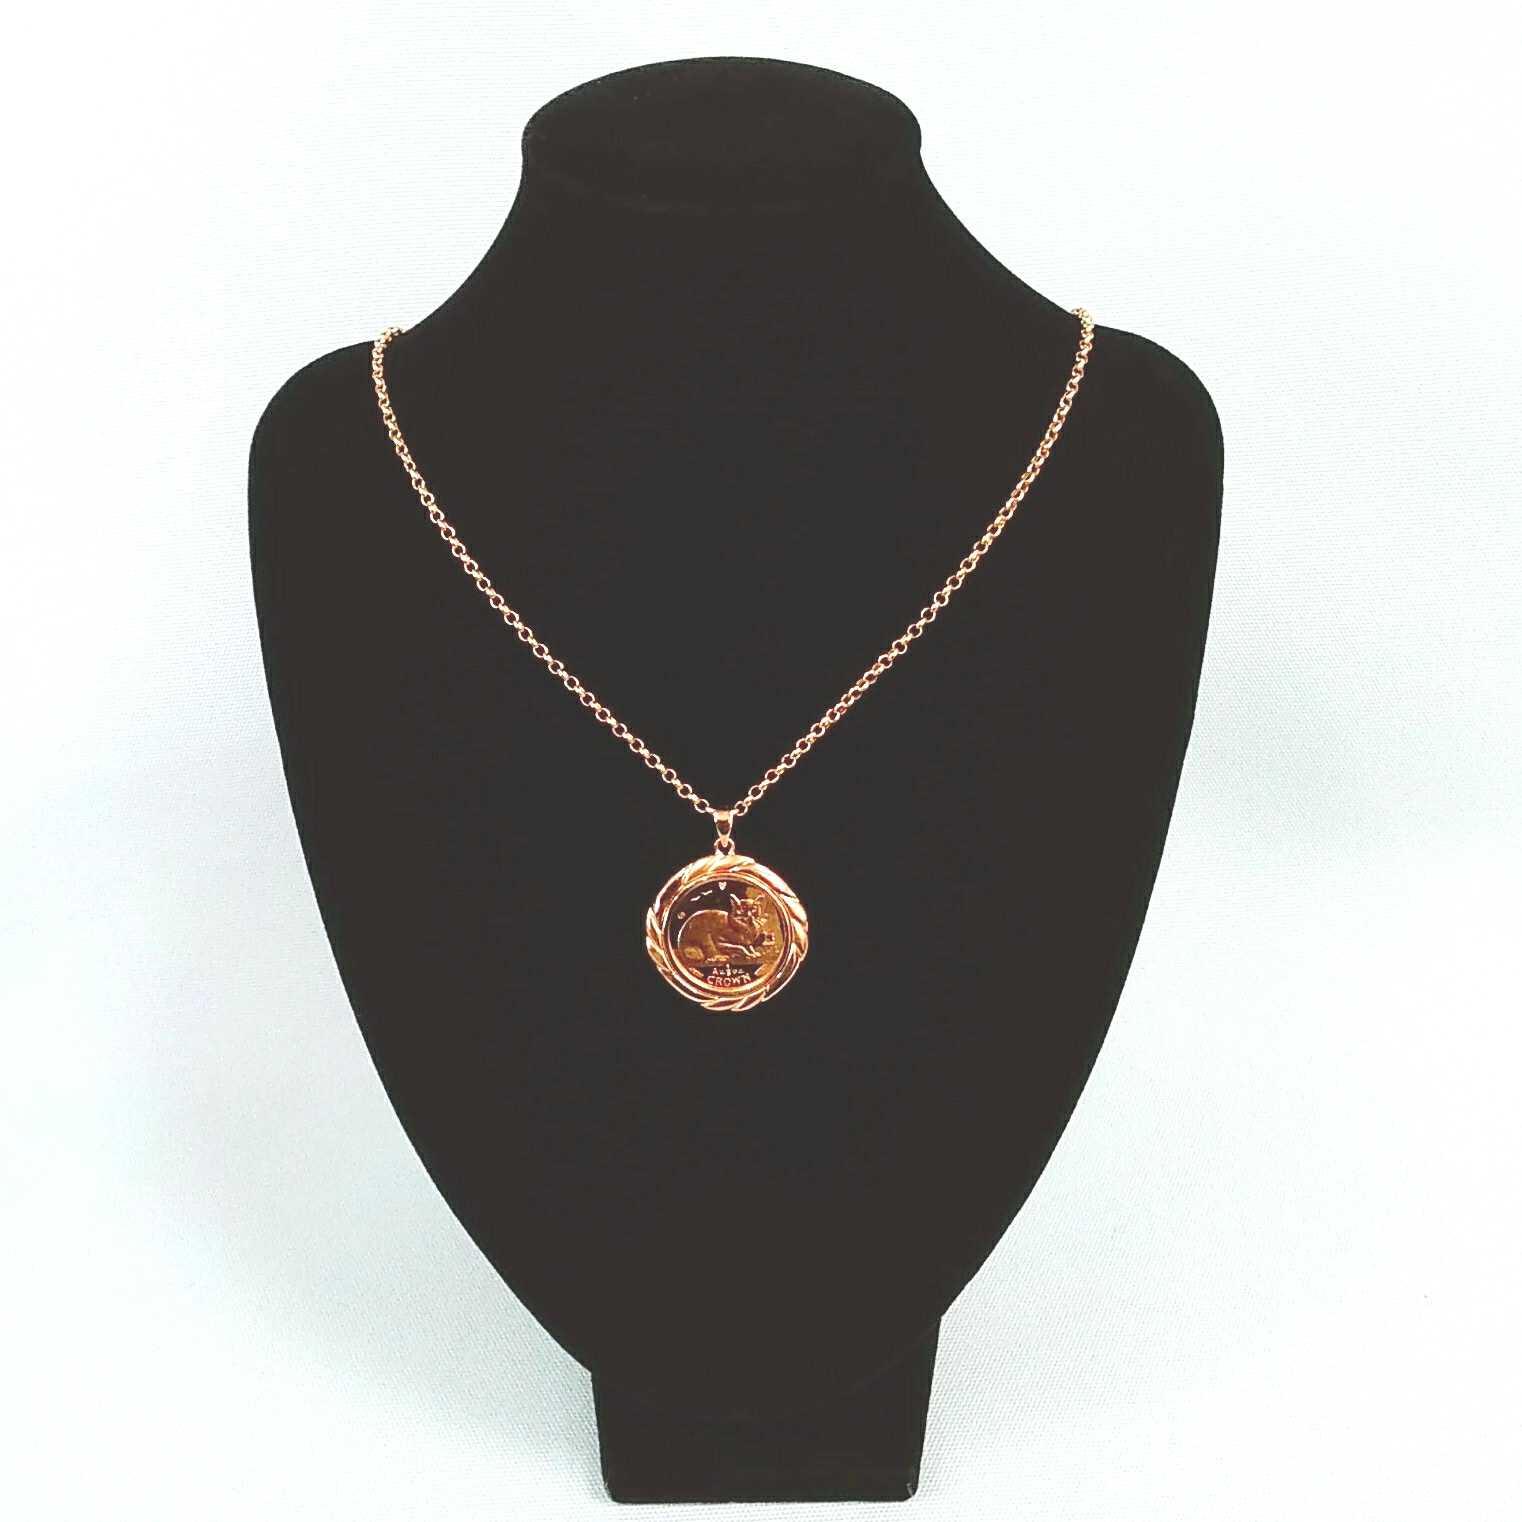 K18コインネックレス|宝石無しネックレス